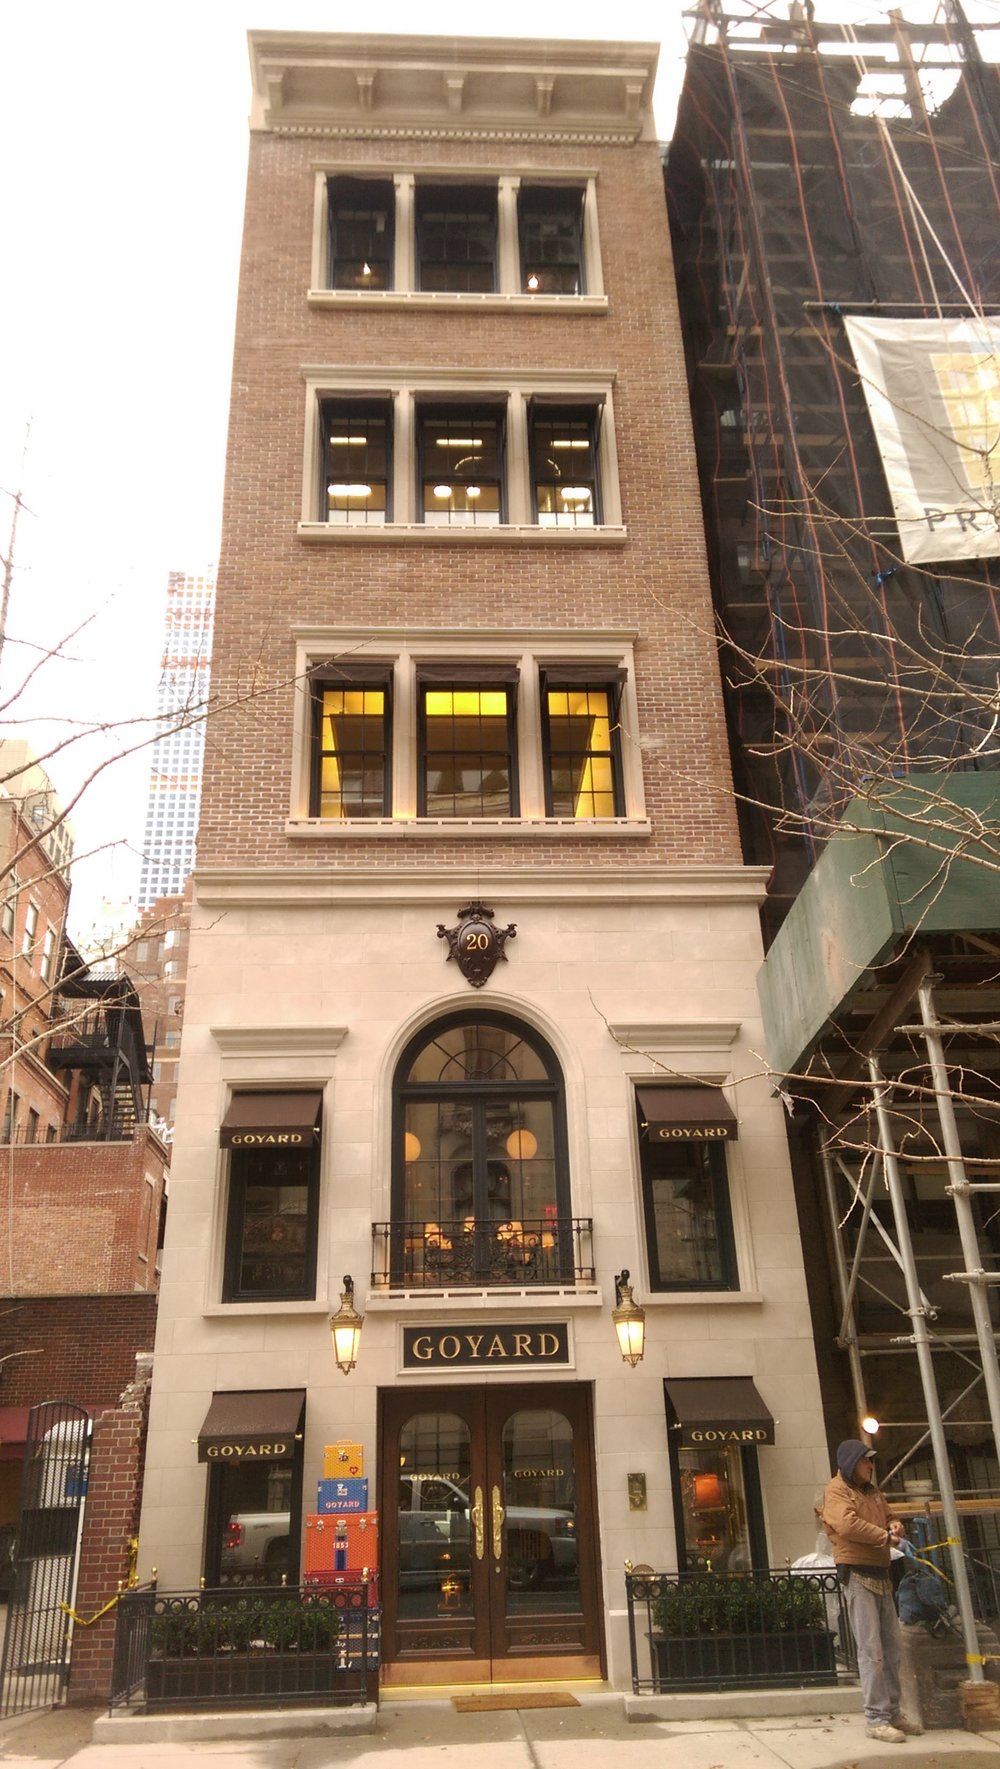 Custom Windows of the Goyard Building